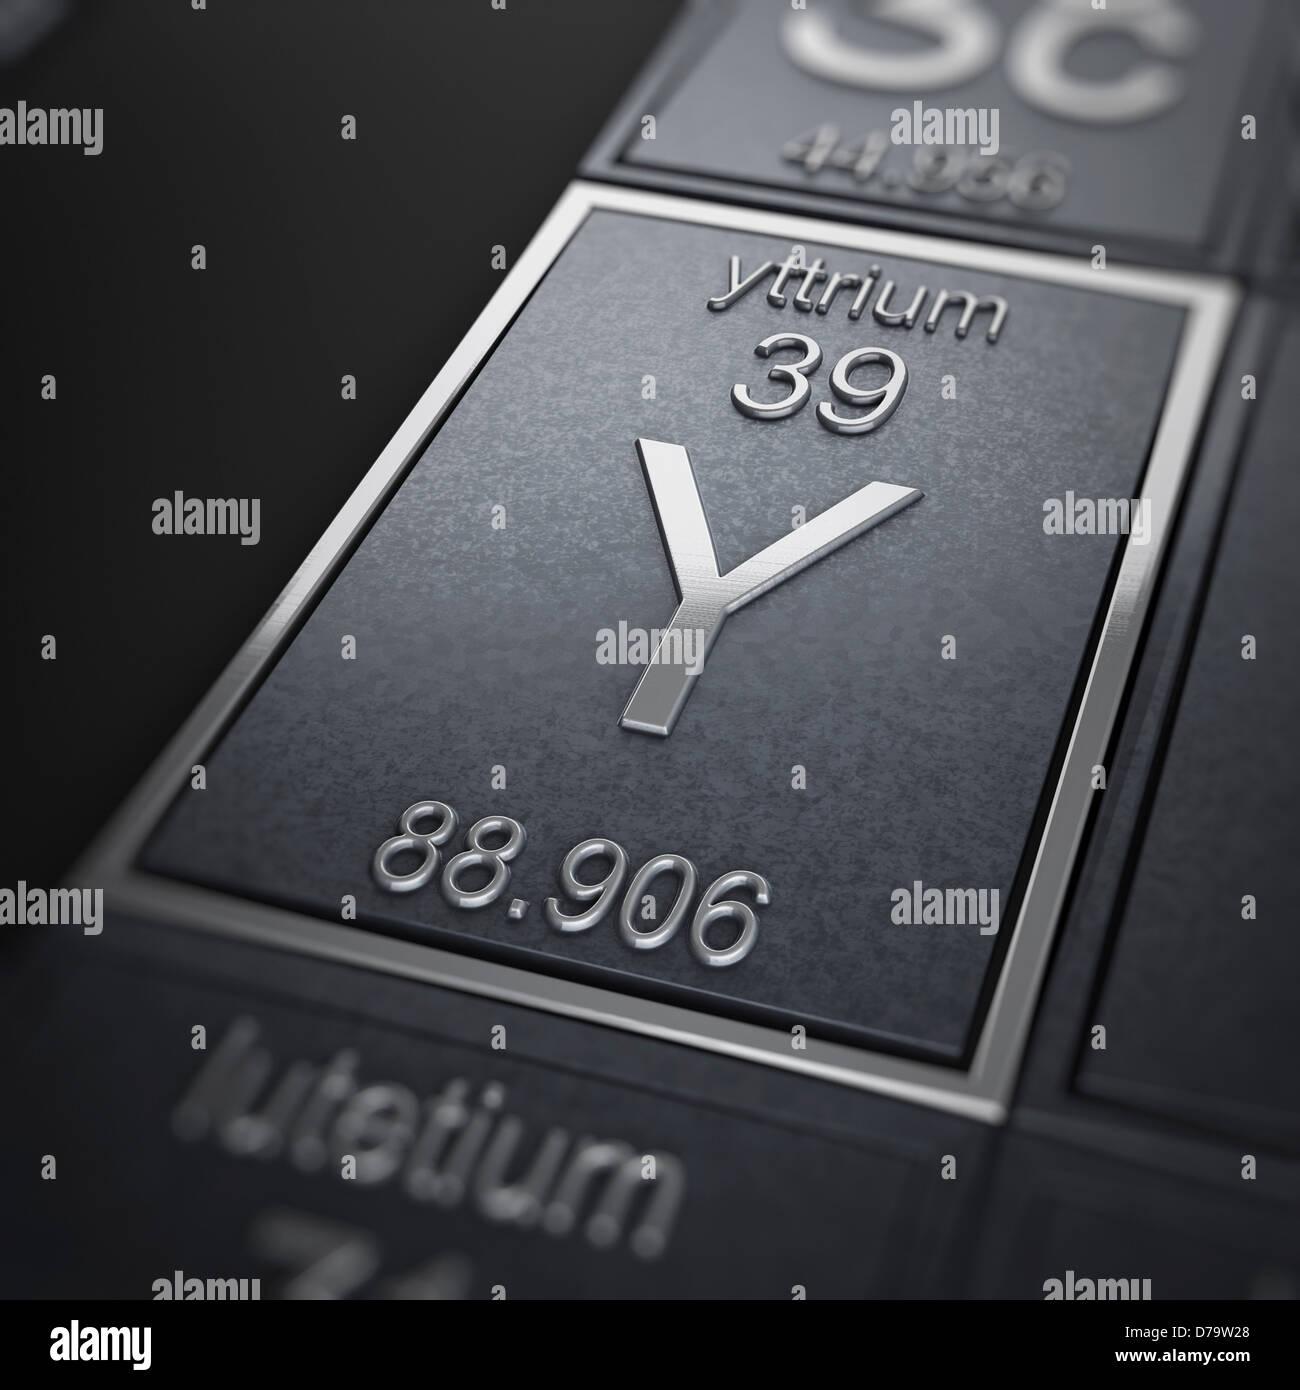 Yttrium Chemical Element Stock Photo 56150928 Alamy